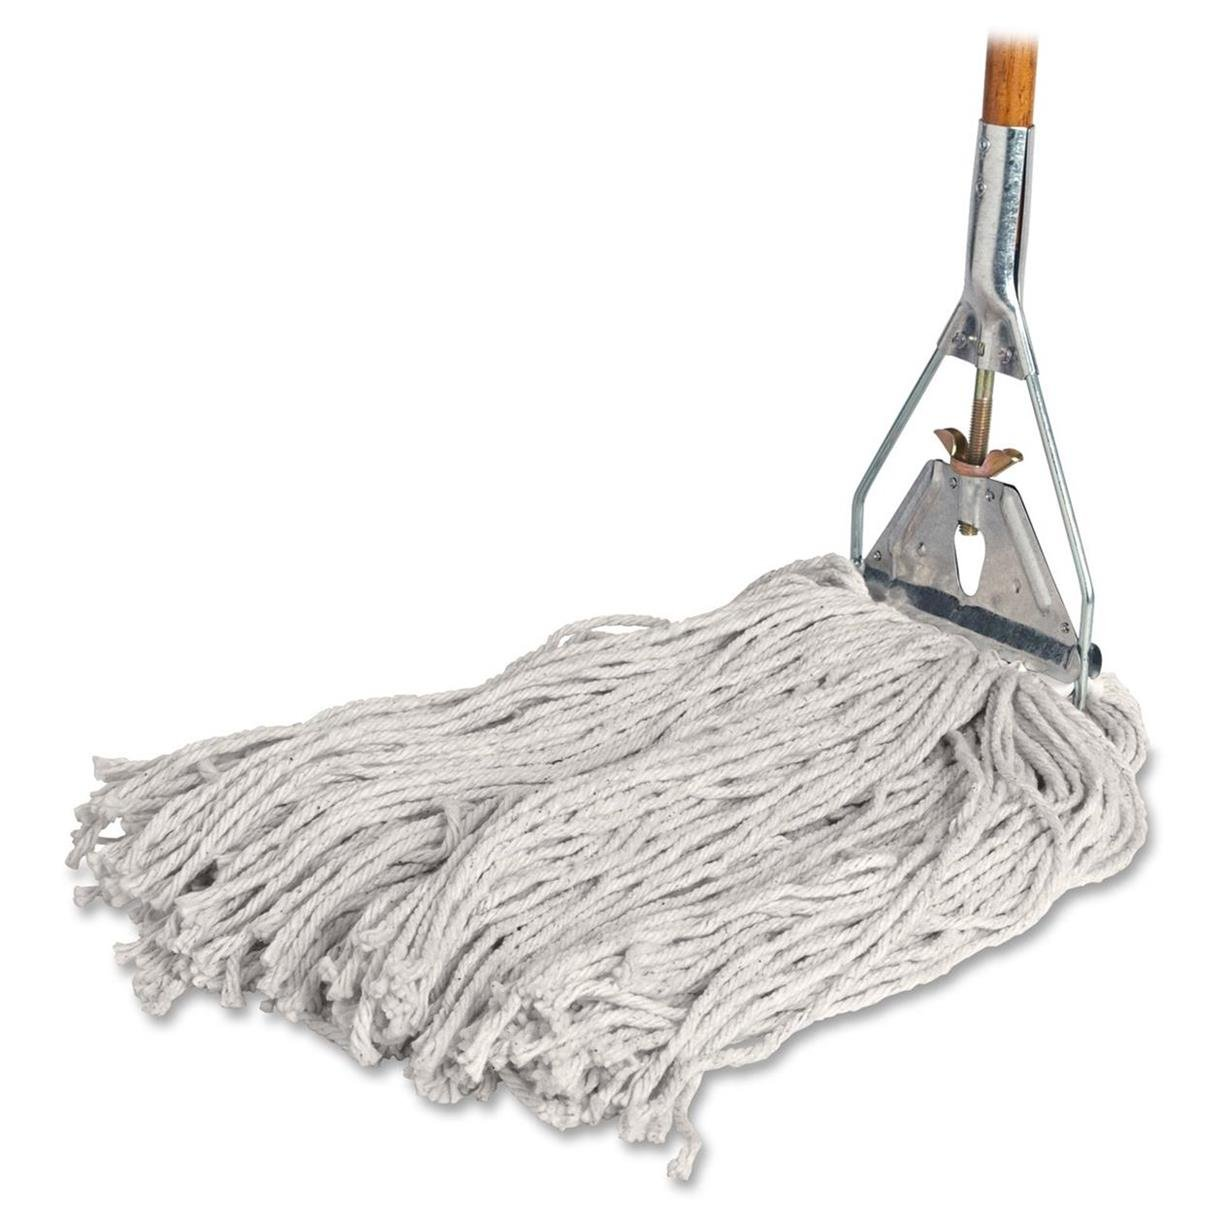 Genuine Joe Cotton Wet Mop with Handle 60'' Width x 0.94'' Height; Cotton HeadWood Handle – Lightweight by Genuine Joe (Image #1)